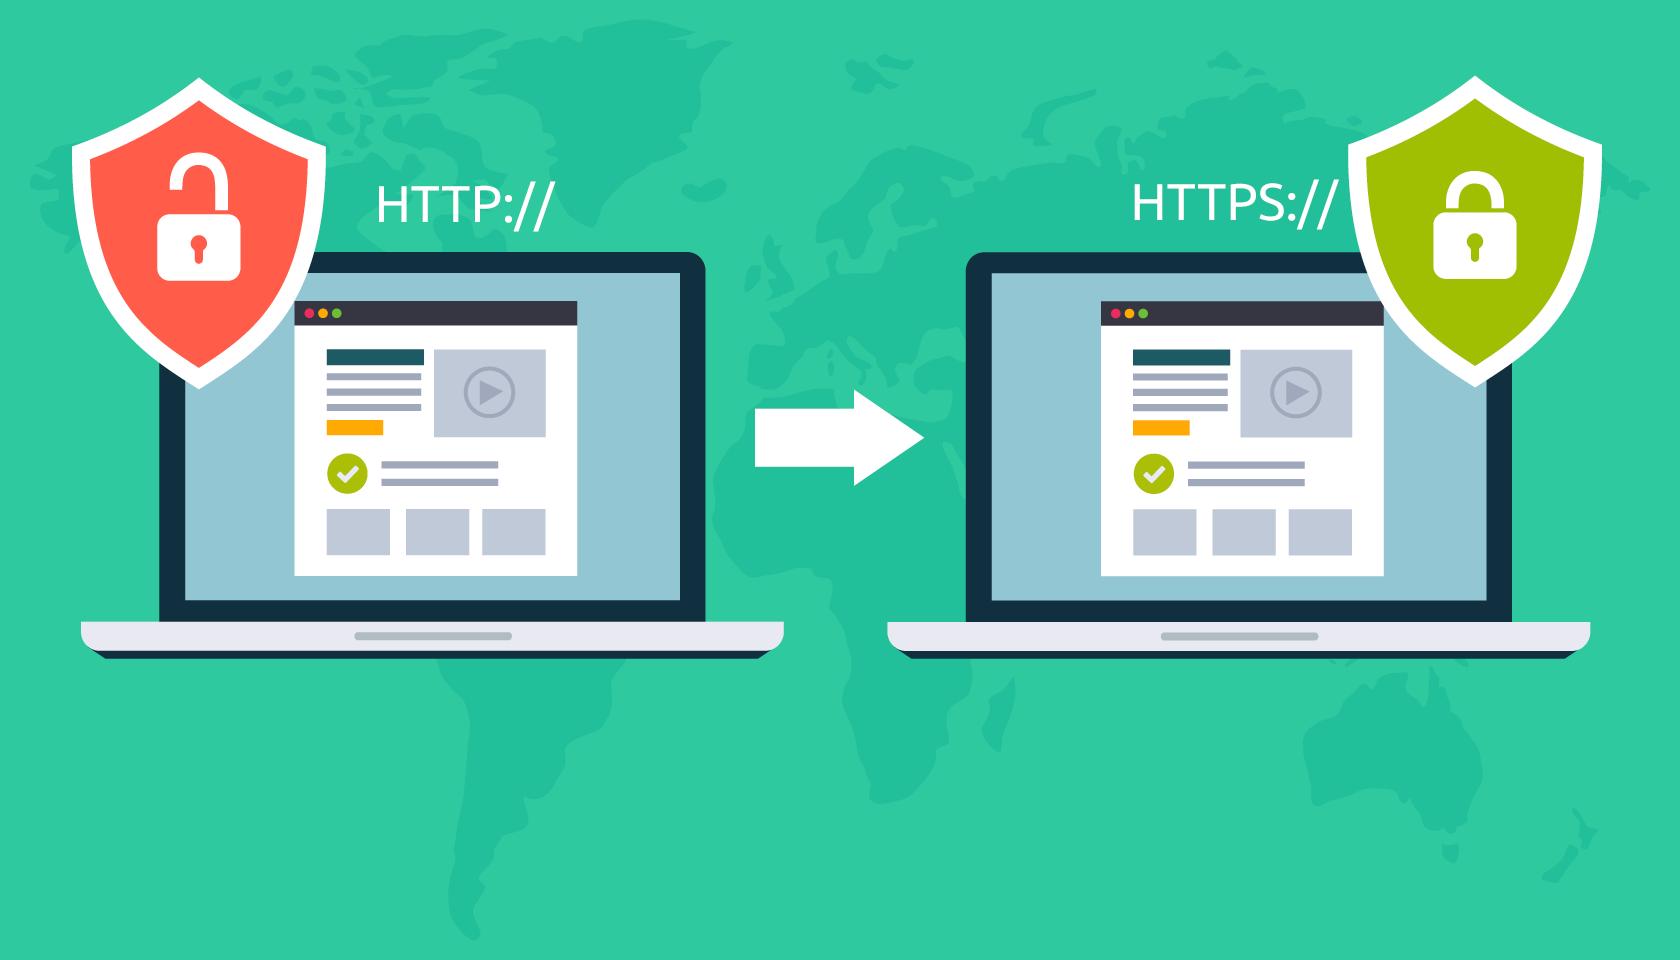 HTTP TO HTTPS